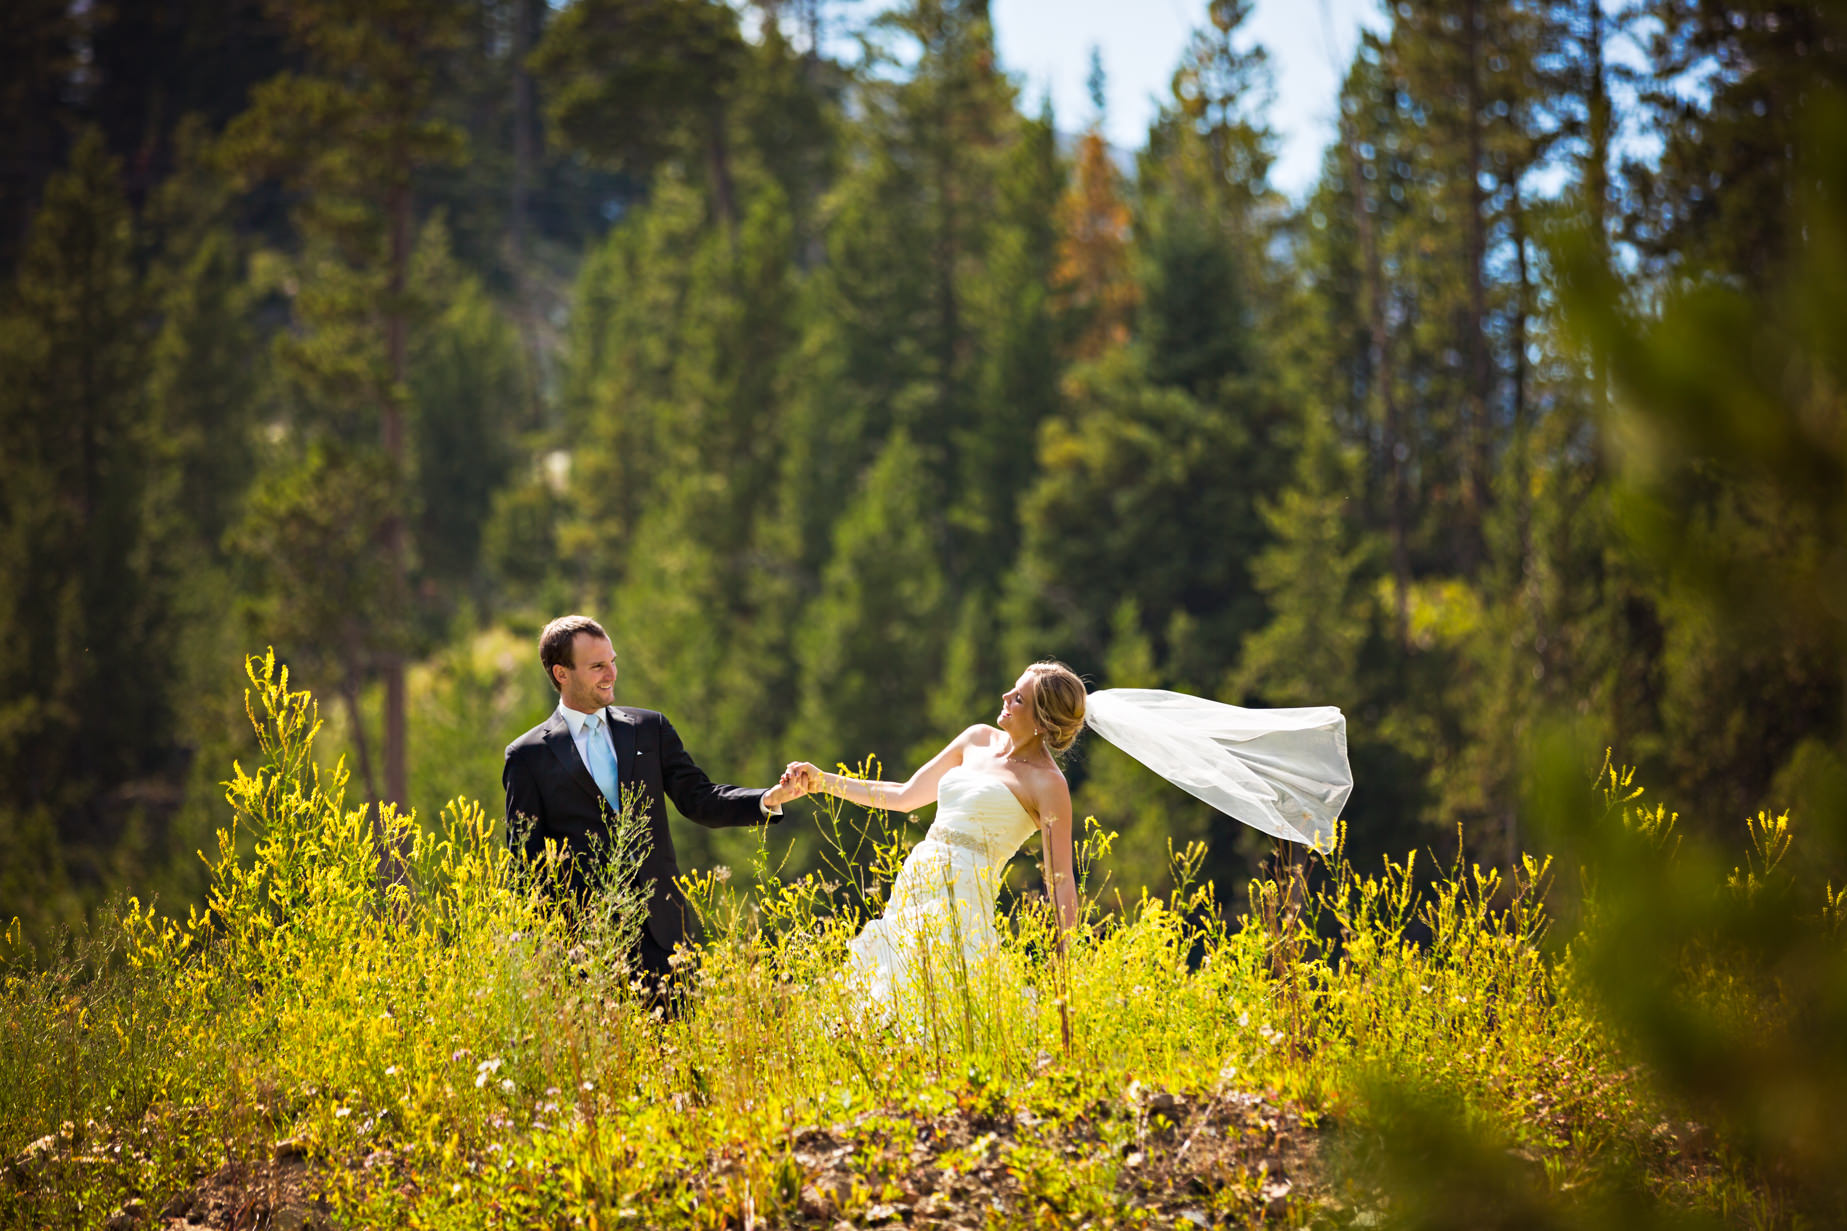 big-sky-resort-wedding-groom-pulls-brides-hand.jpg